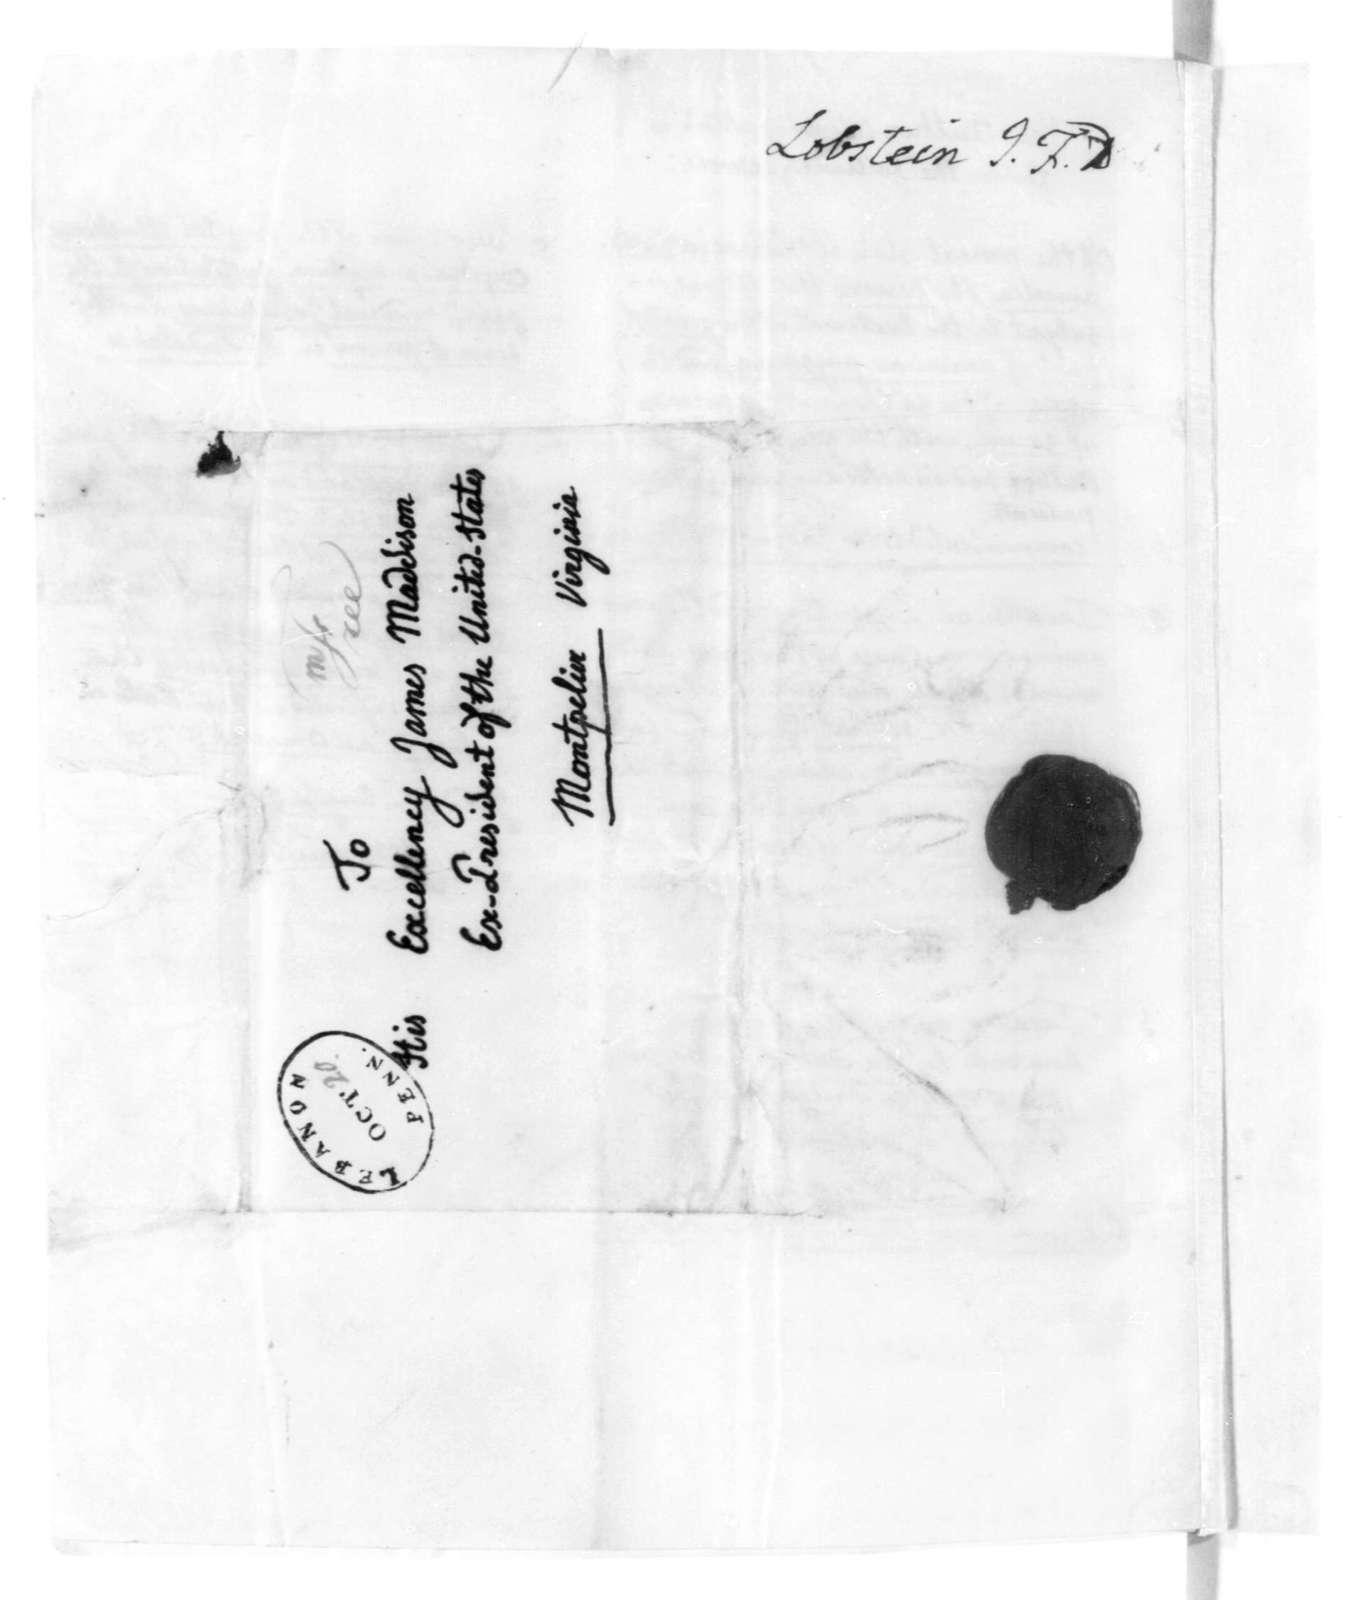 J. F. Daniel Lobstein to James Madison, October 19, 1822. & Observations on US.